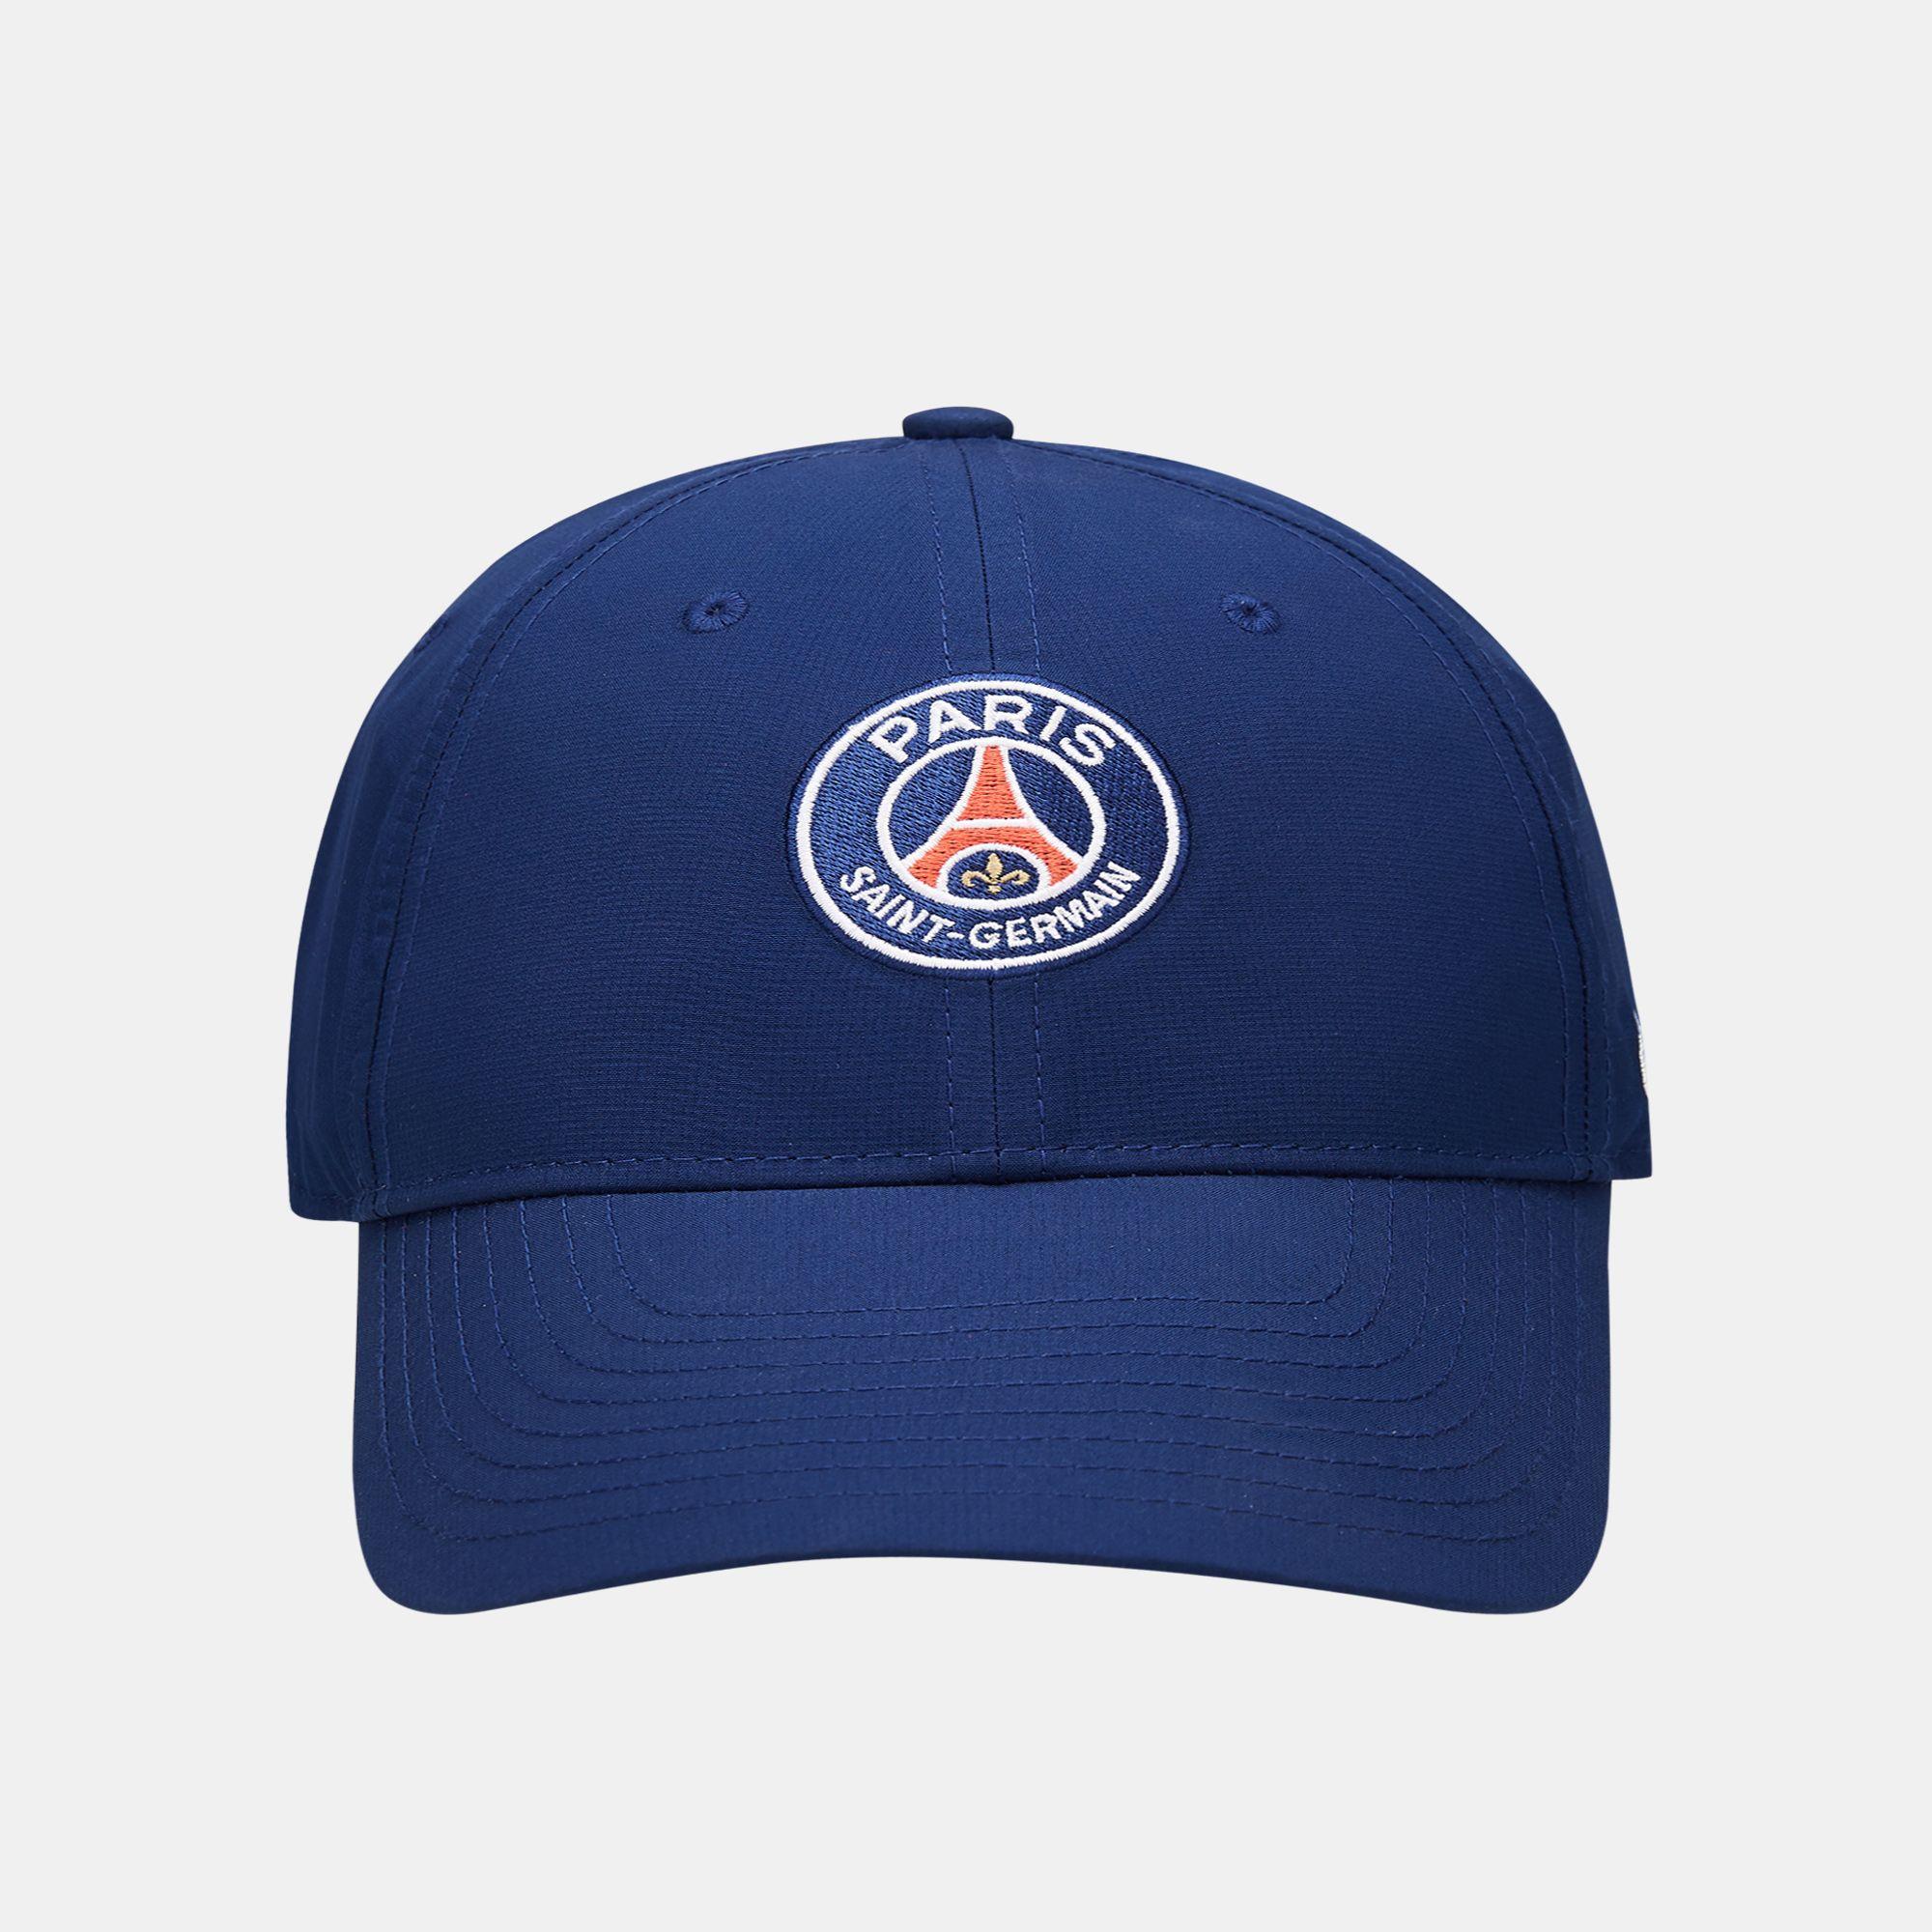 6189fc057 Nike Men's Paris Saint-Germain Legacy91 Adjustable Hat